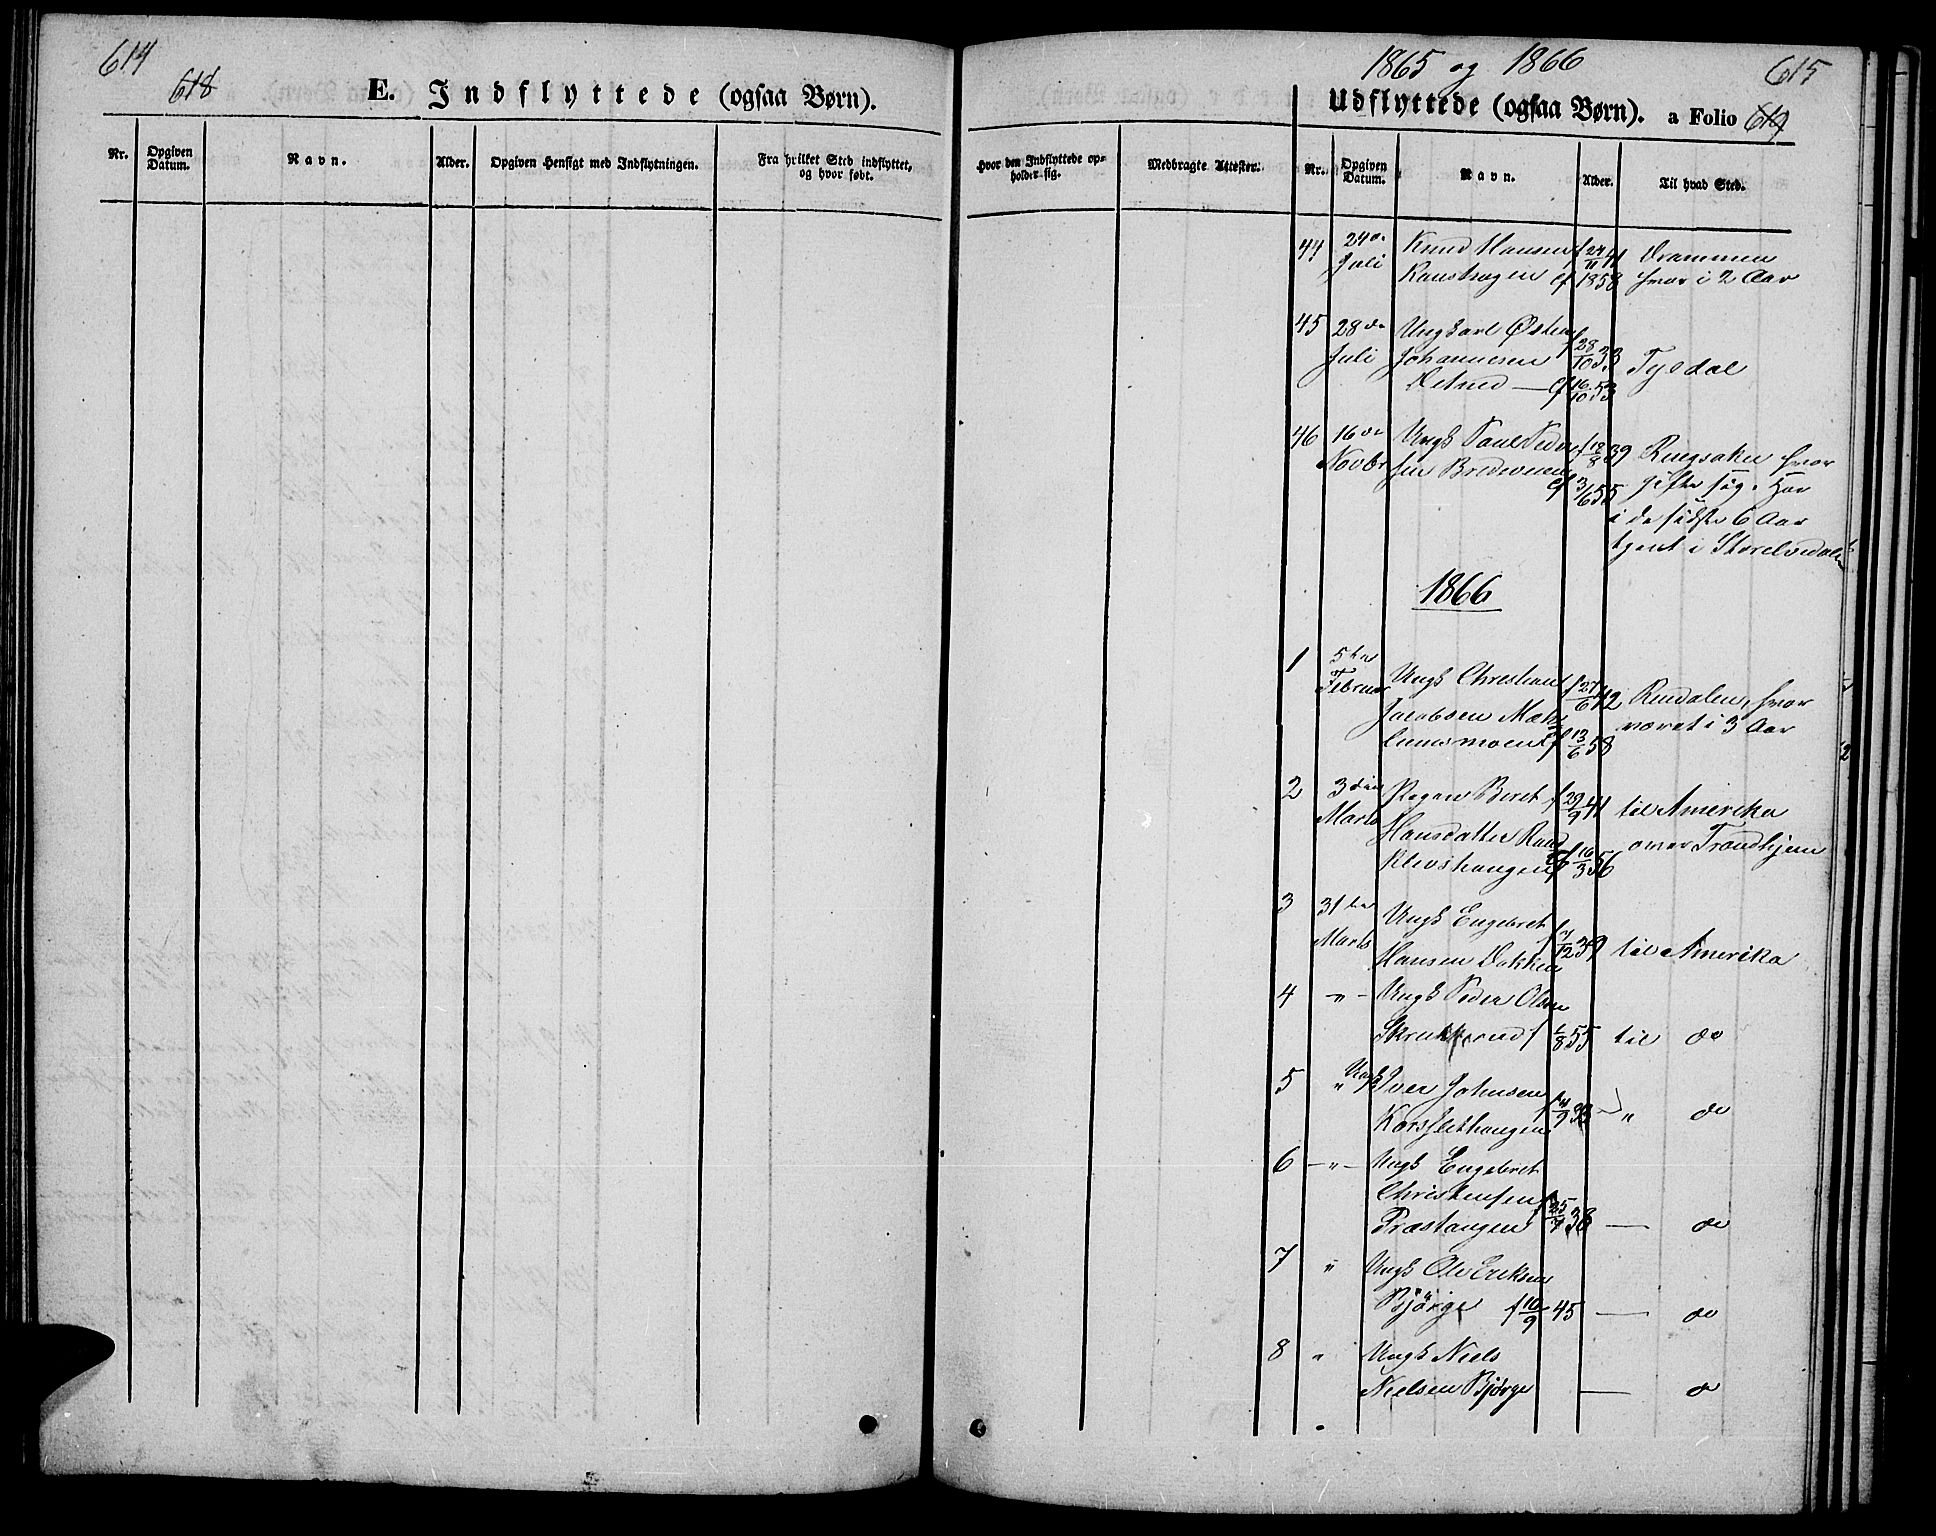 SAH, Ringebu prestekontor, Klokkerbok nr. 3, 1854-1866, s. 614-615